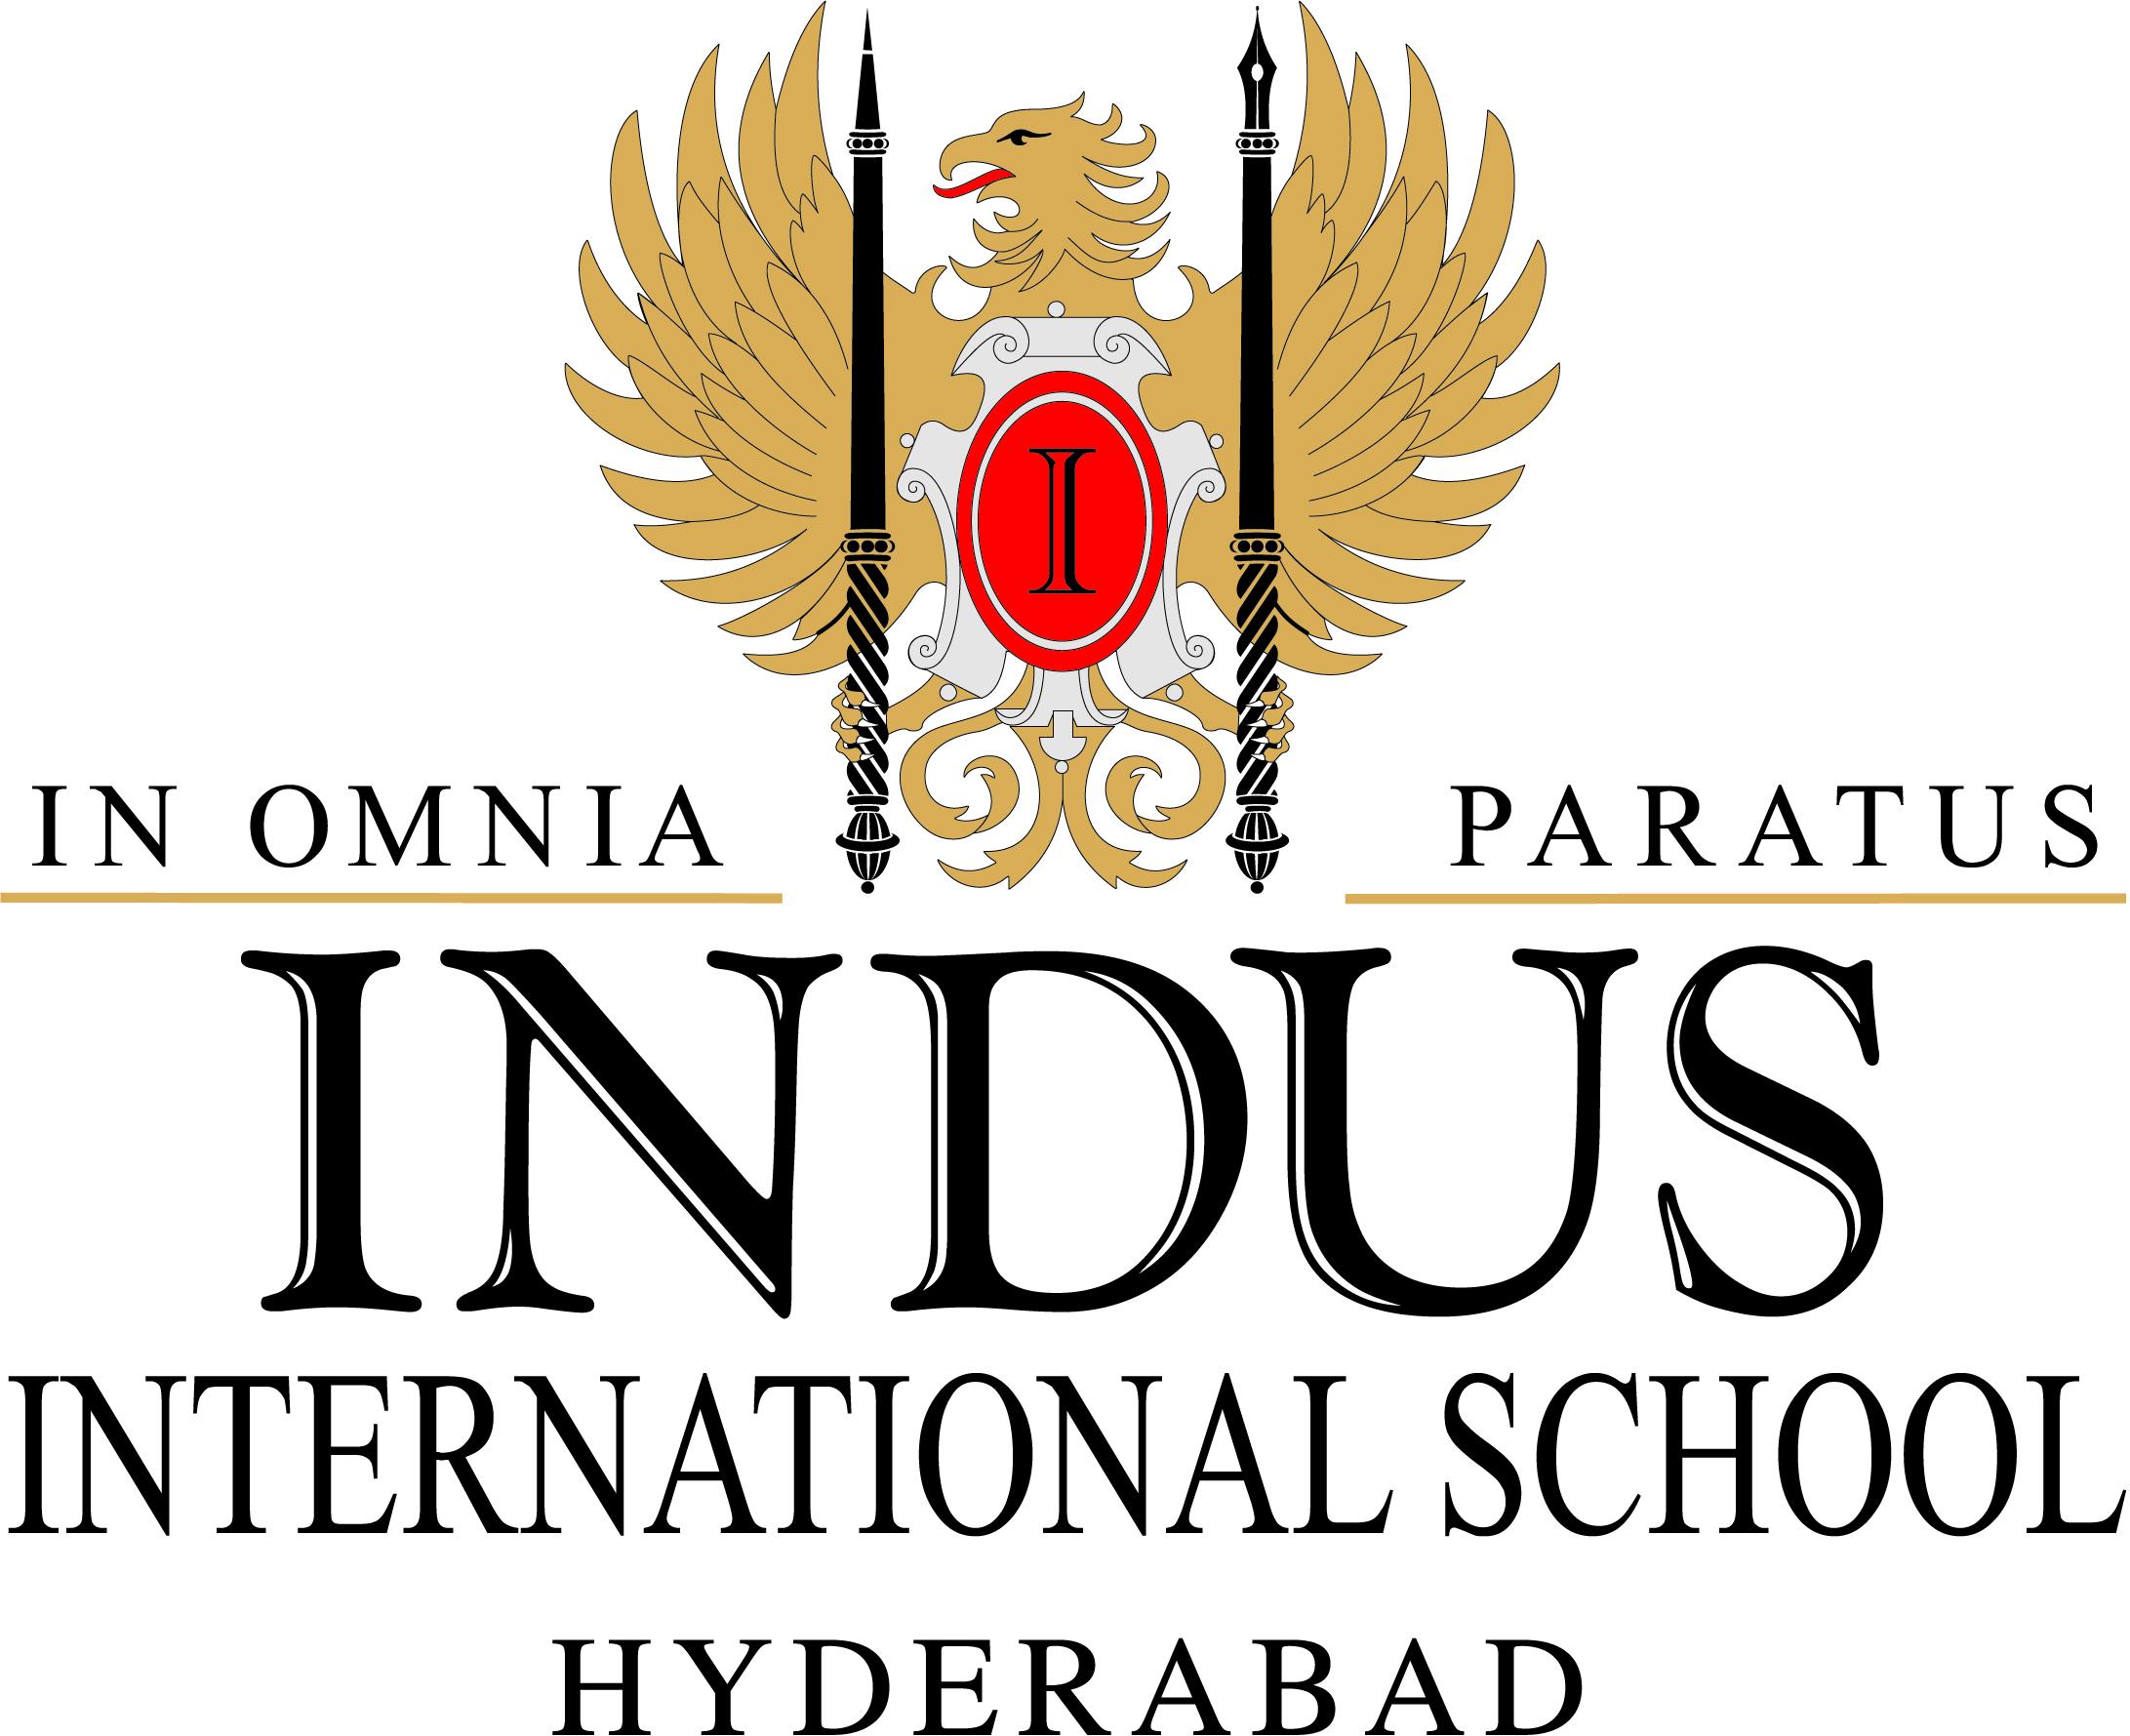 Indus International School - Hyderabad Image